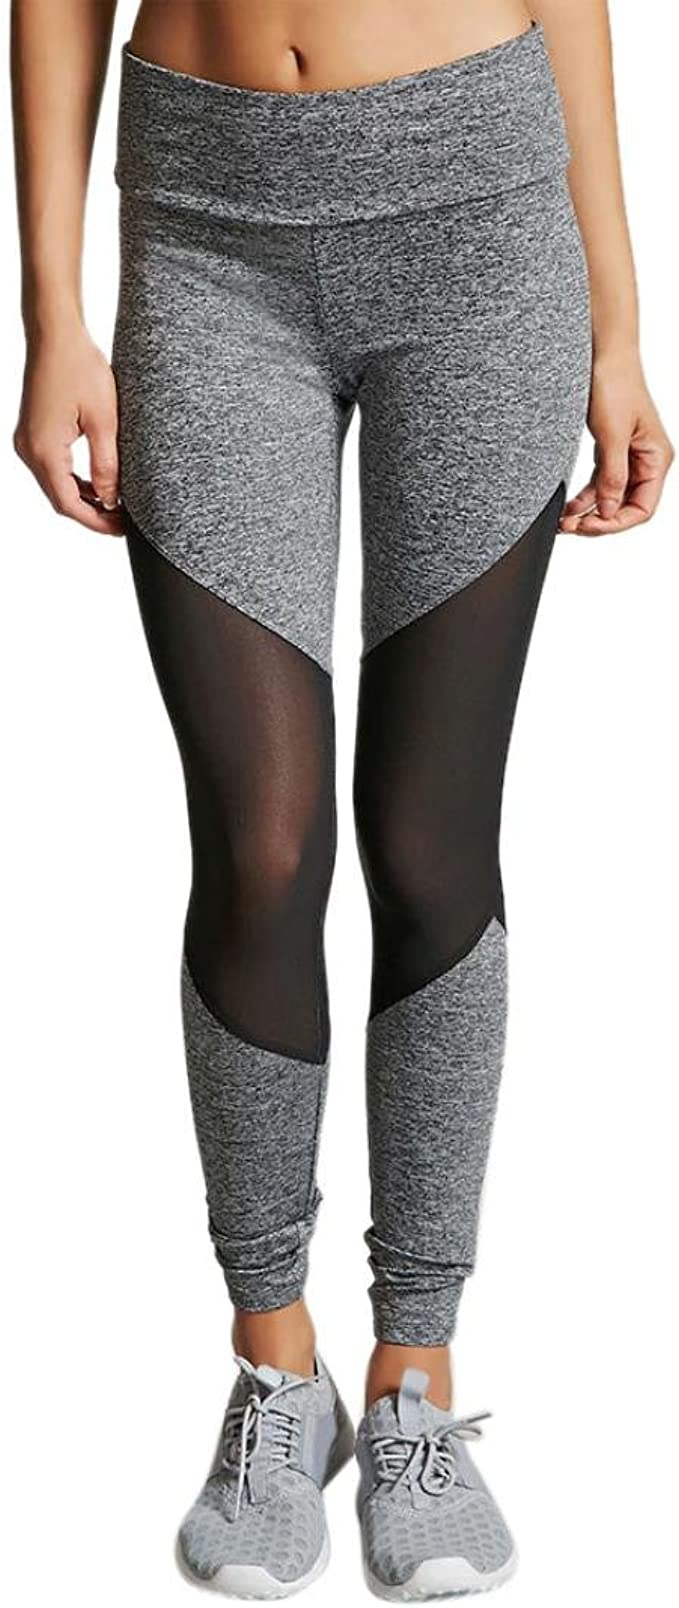 Women Yoga Pants High Waist Gym Sportswear Running Fitness Leggings Gym Trousers